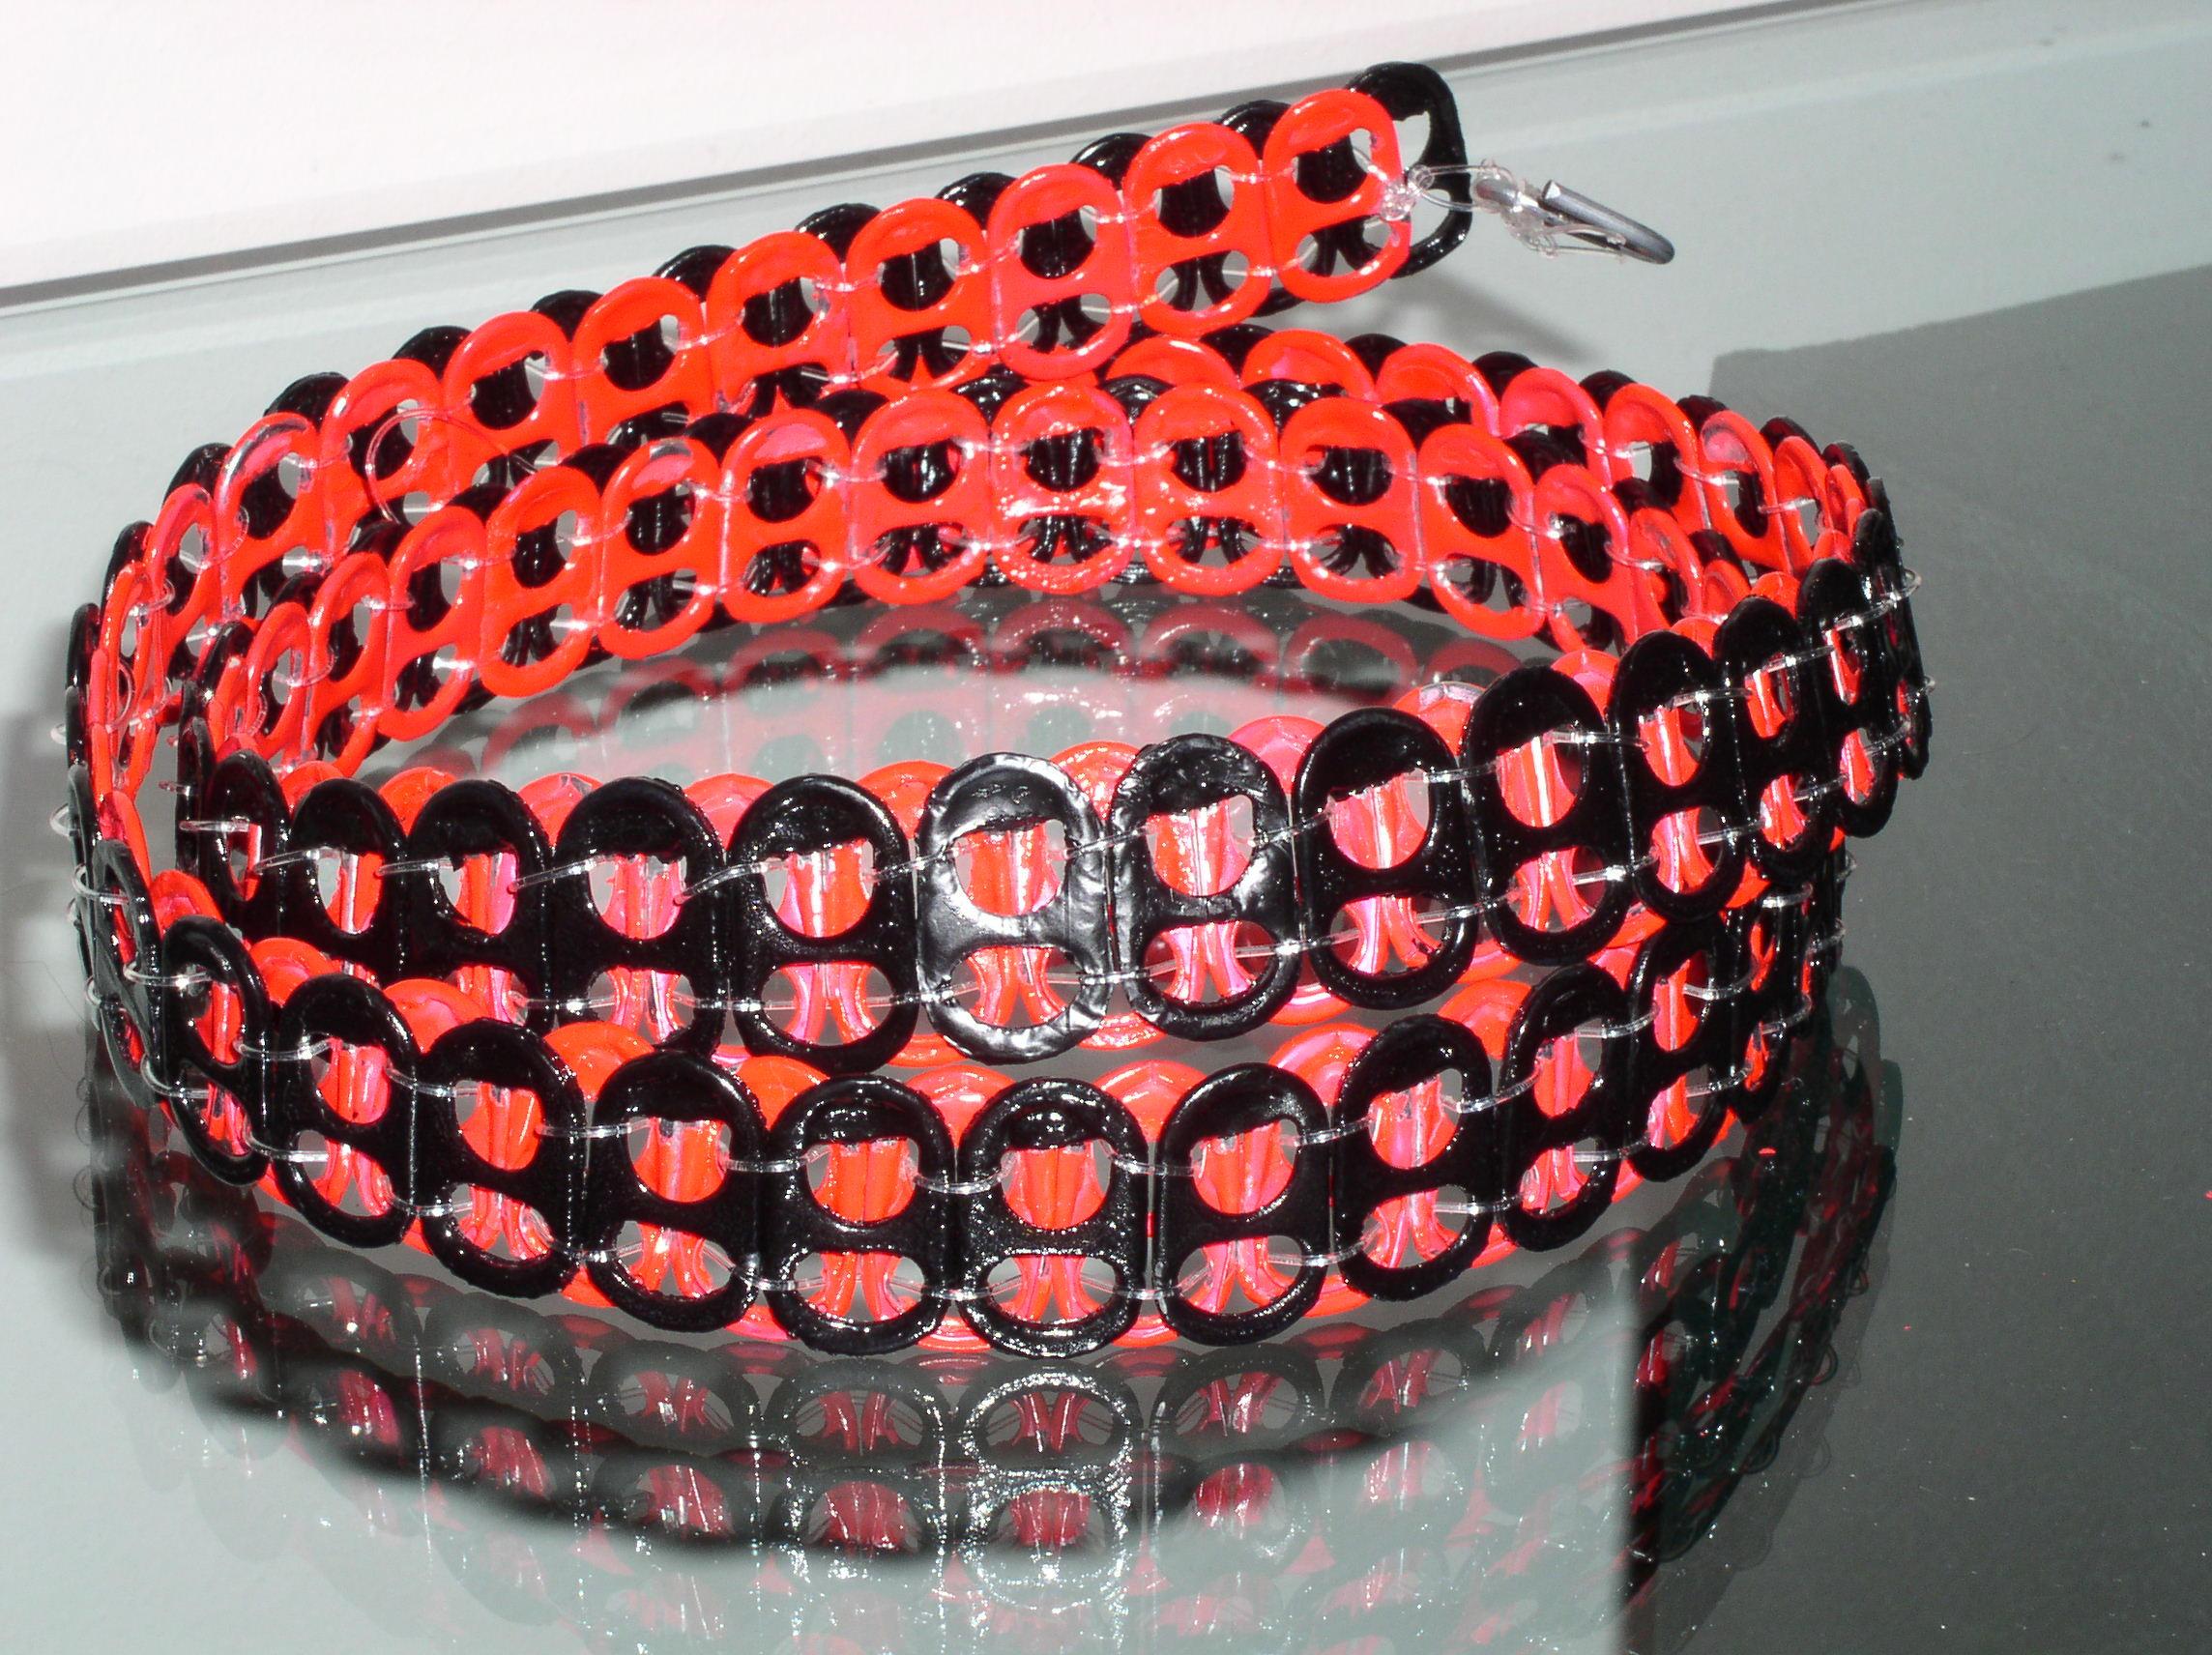 Soda pop tabs crafts - Pop Tab Belt By Dietcokefiend Pop Tab Belt By Dietcokefiend